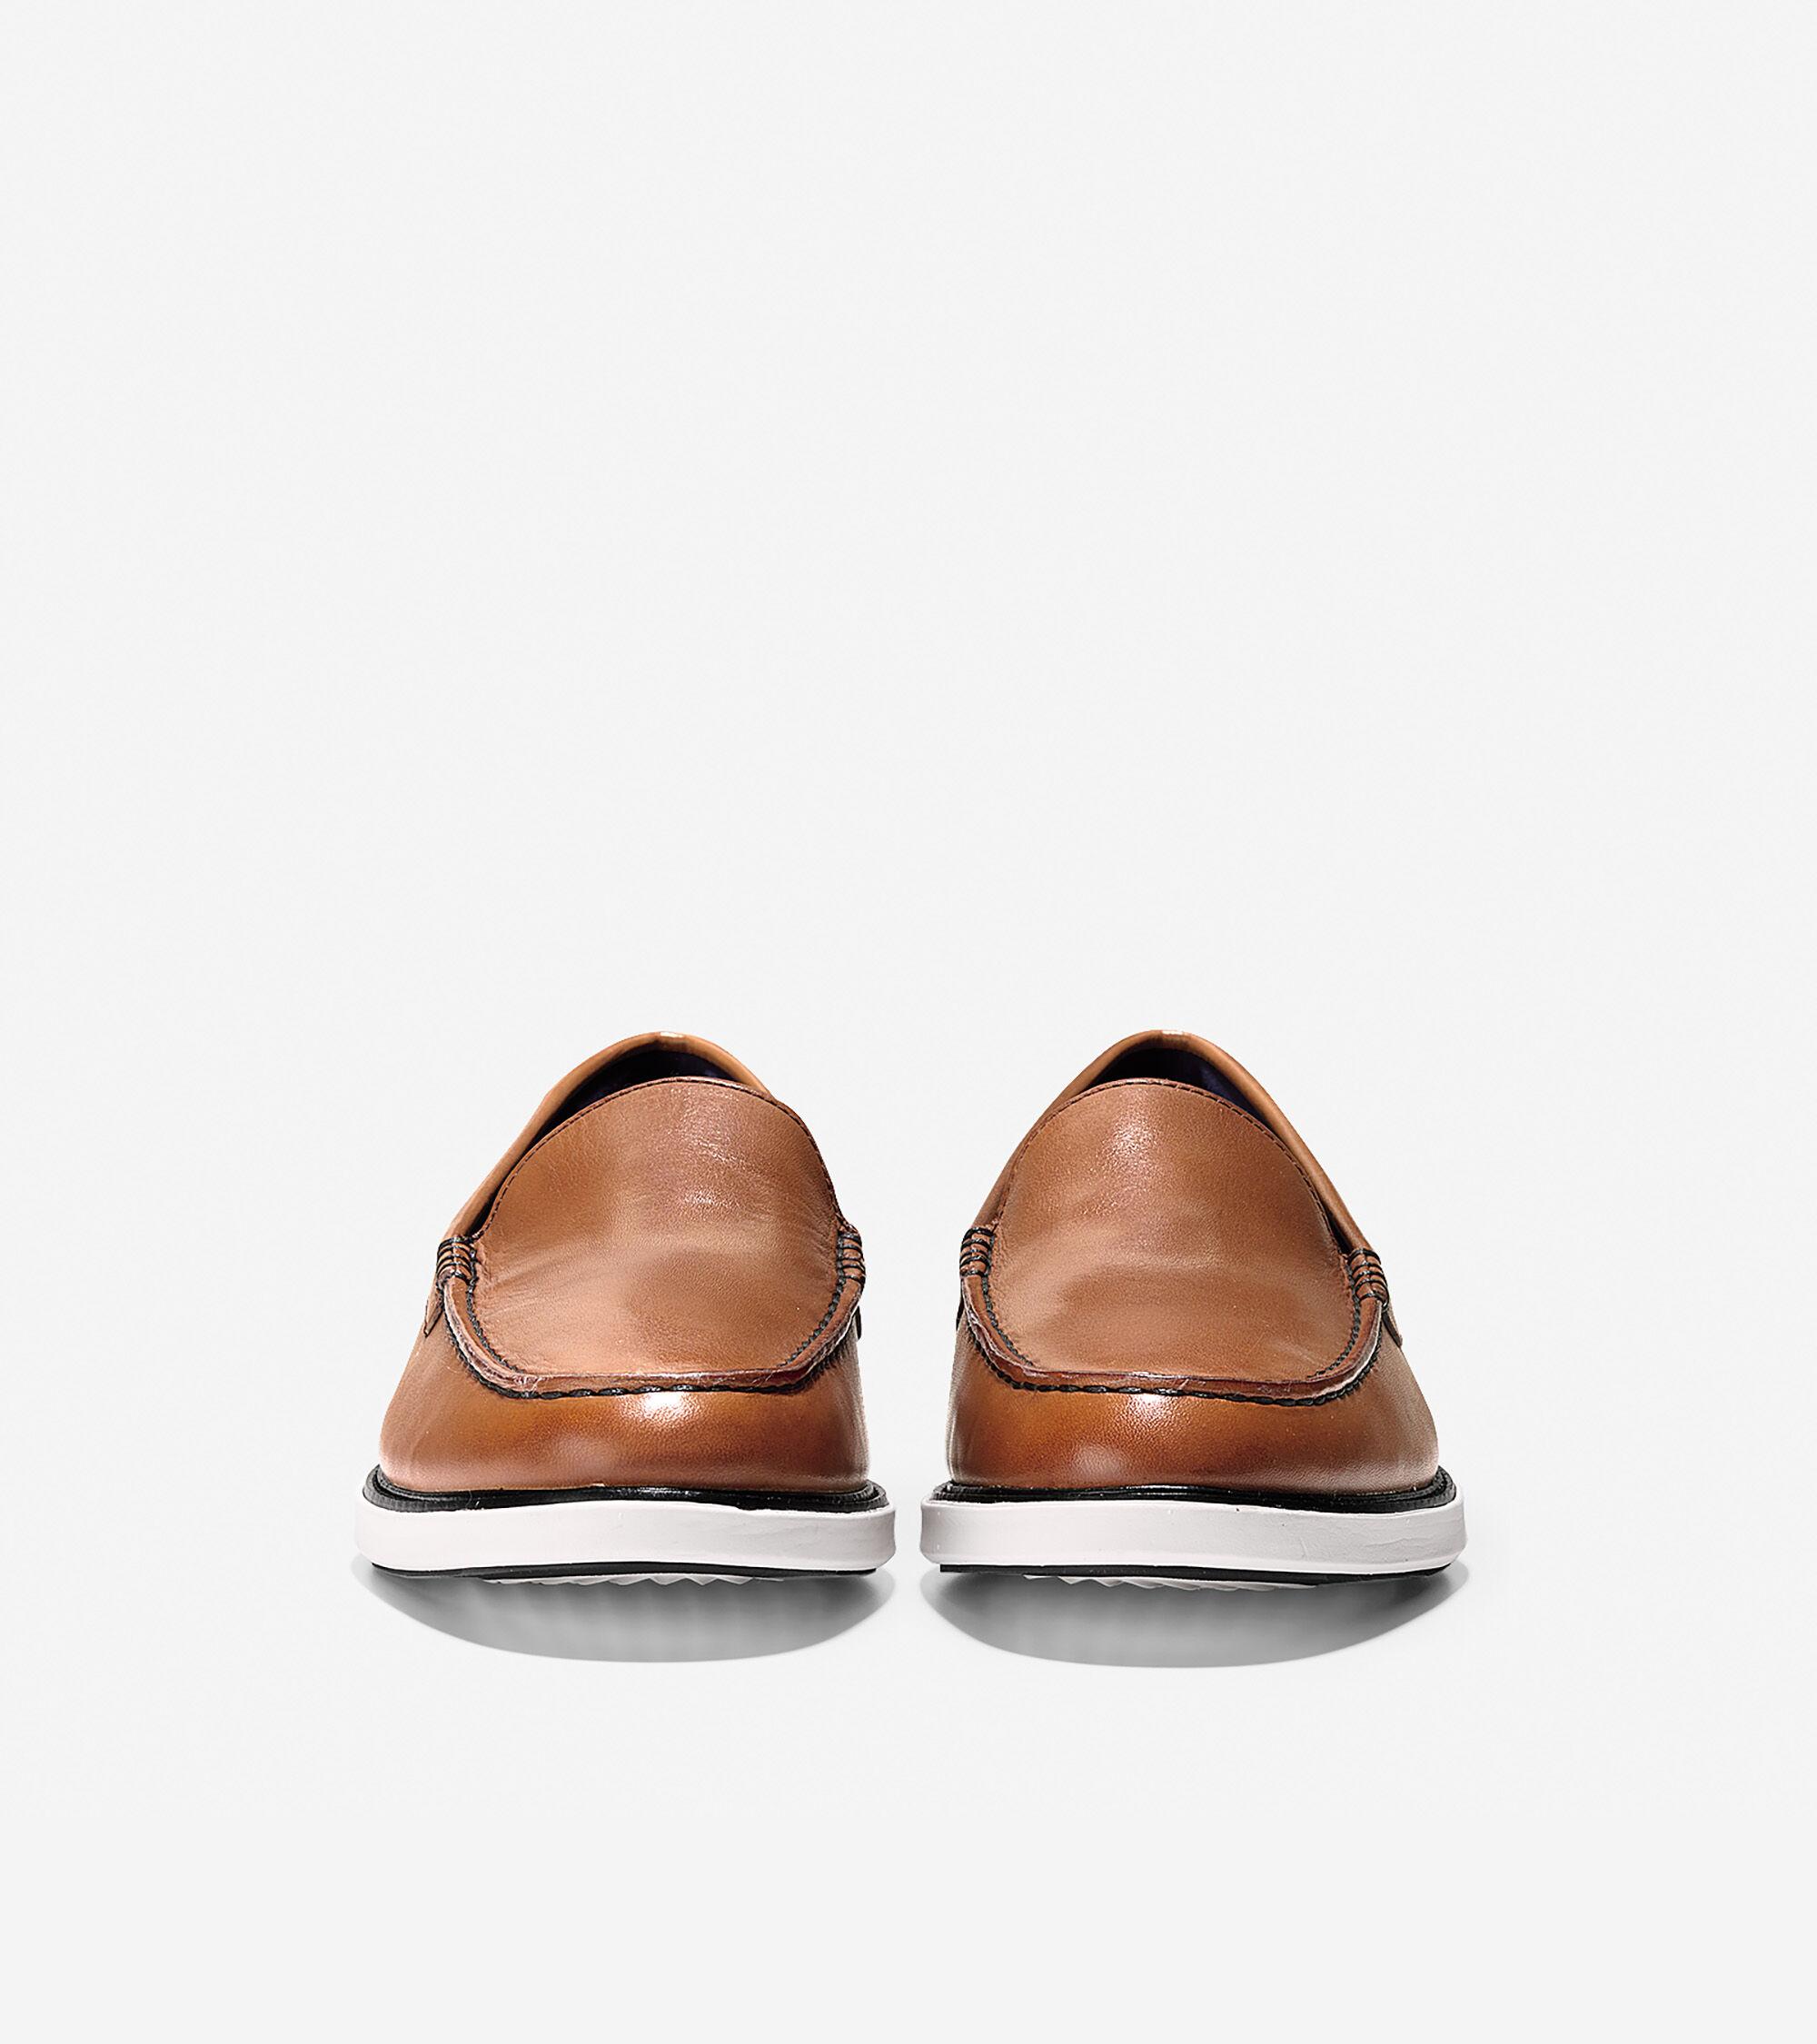 98866a29177 Men s GrandEvølution Venetian Loafer · Men s GrandEvølution Venetian Loafer  ...